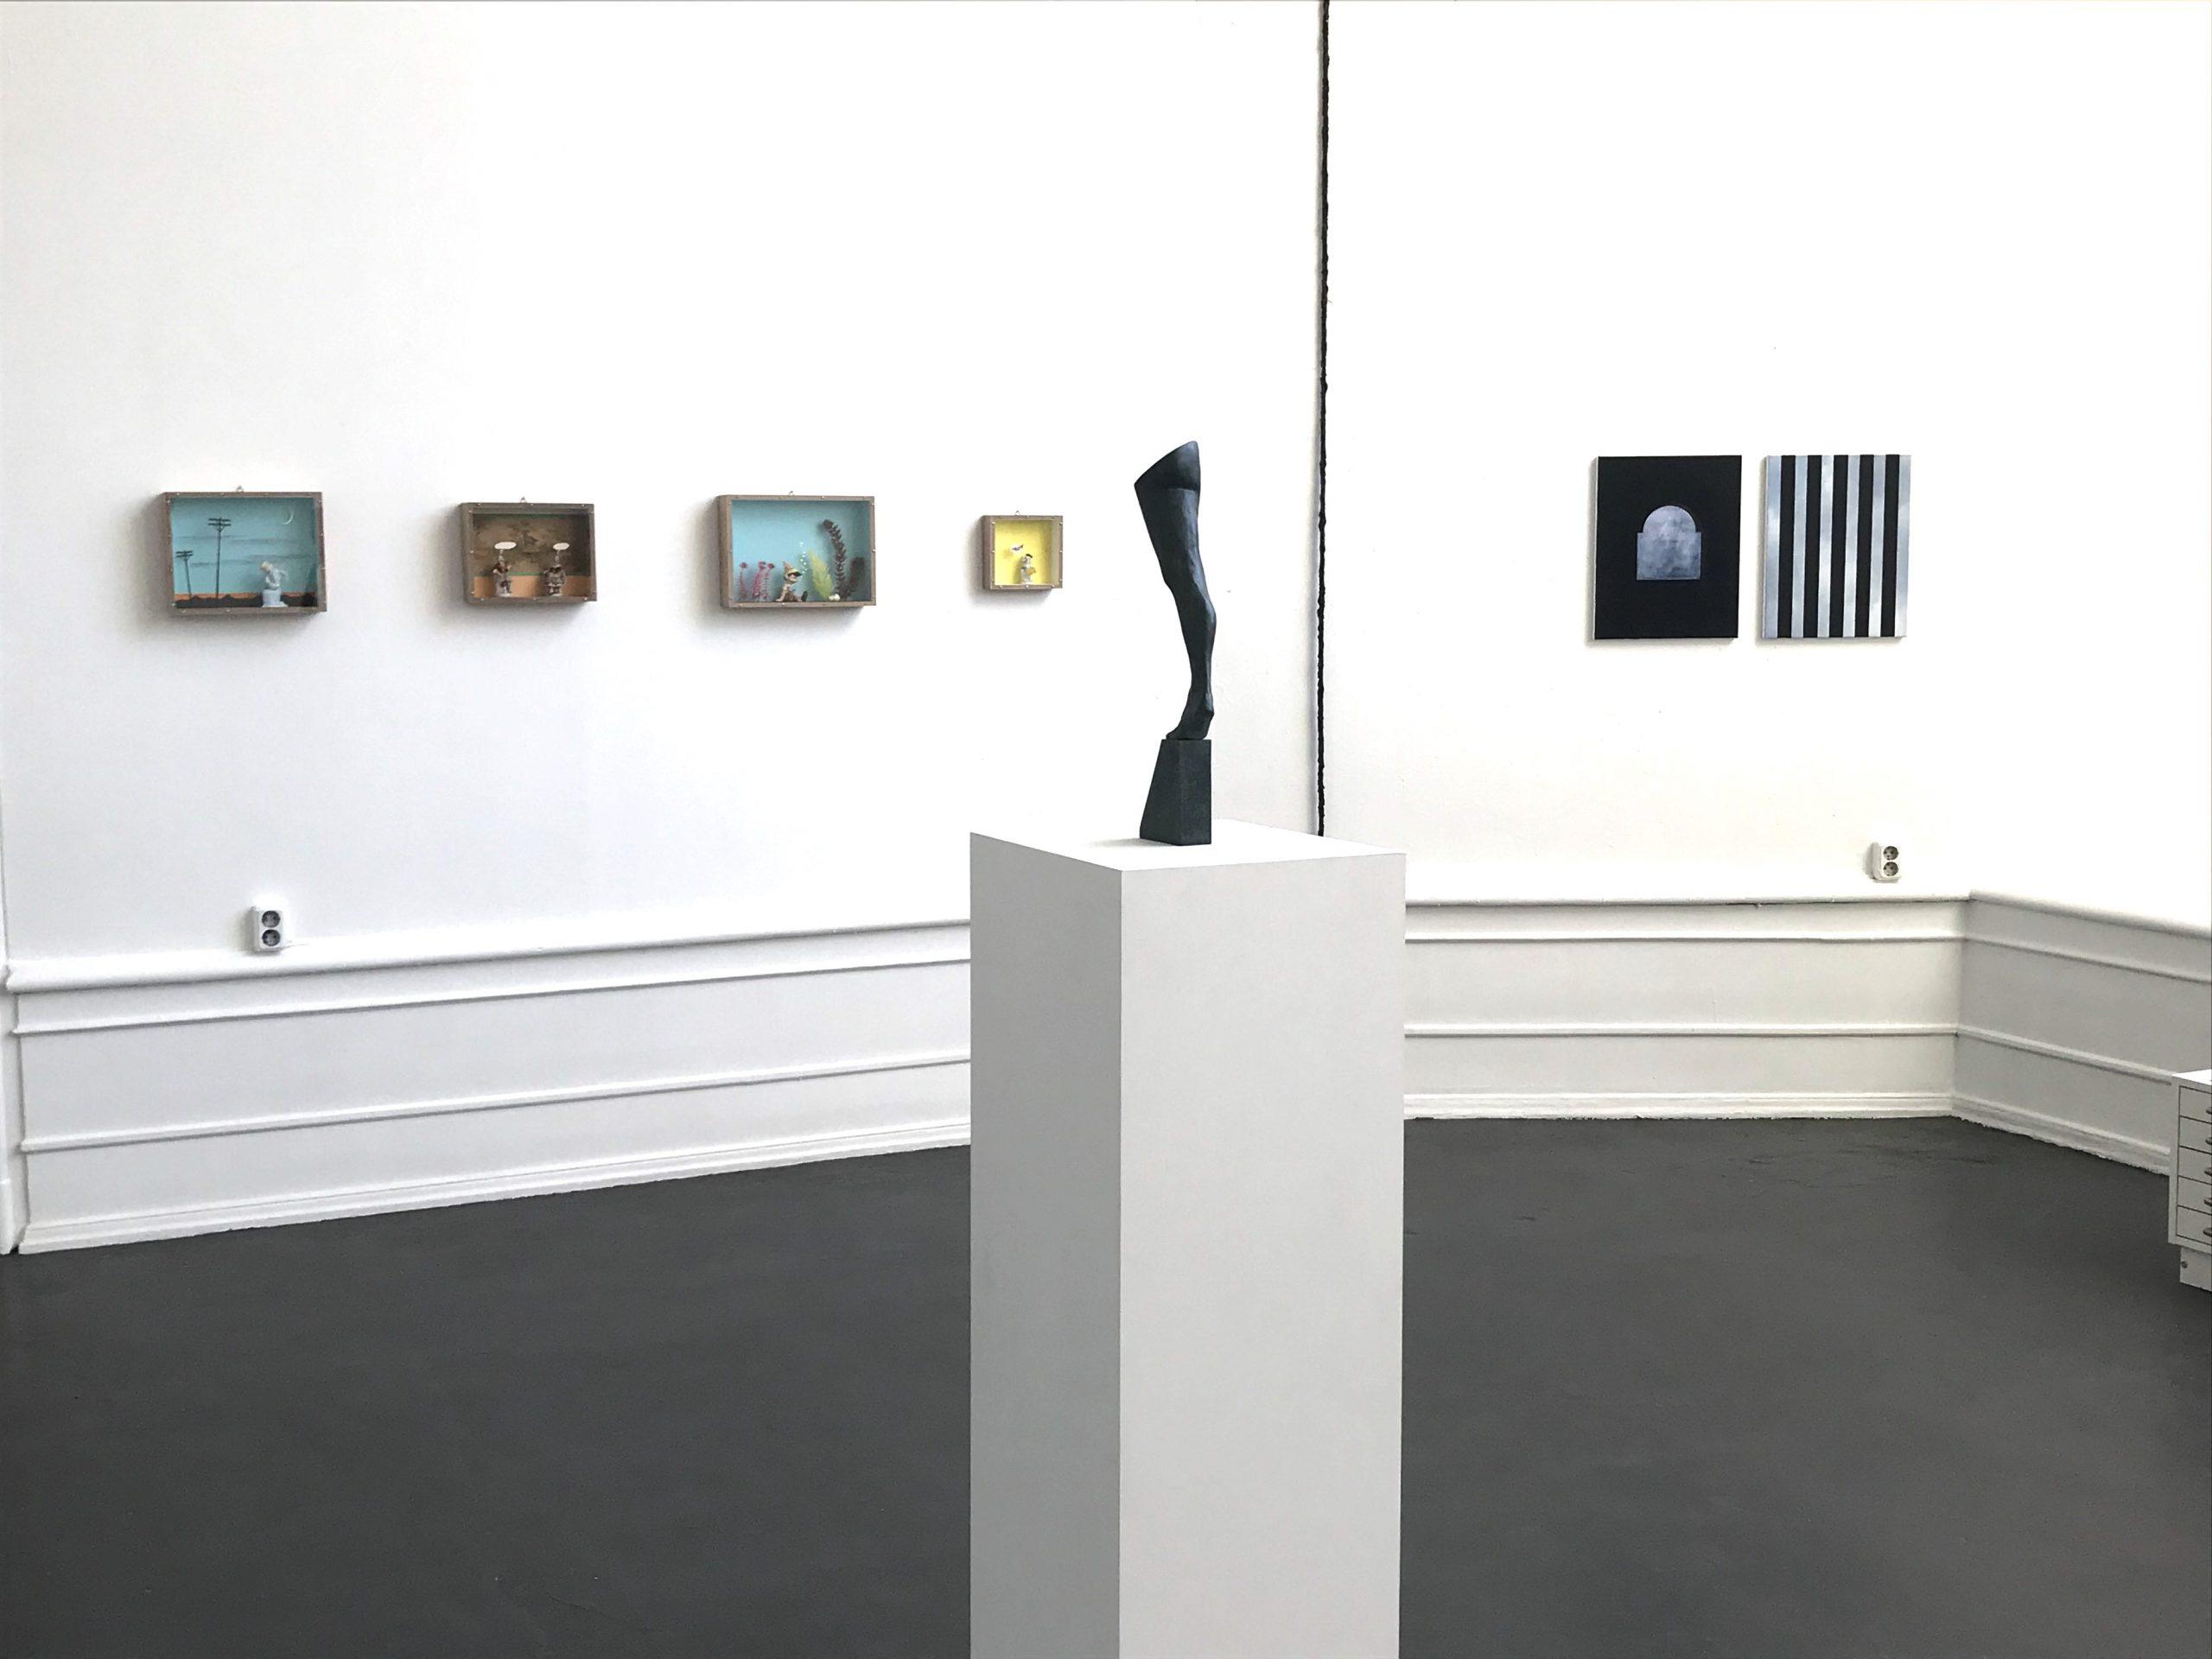 Ande och Materia / Mind and Matter, April 2020. Fredrik Wretman (sculpture), Thomas Olsson (objects), Jakob Solgren (sculpture / paintings)